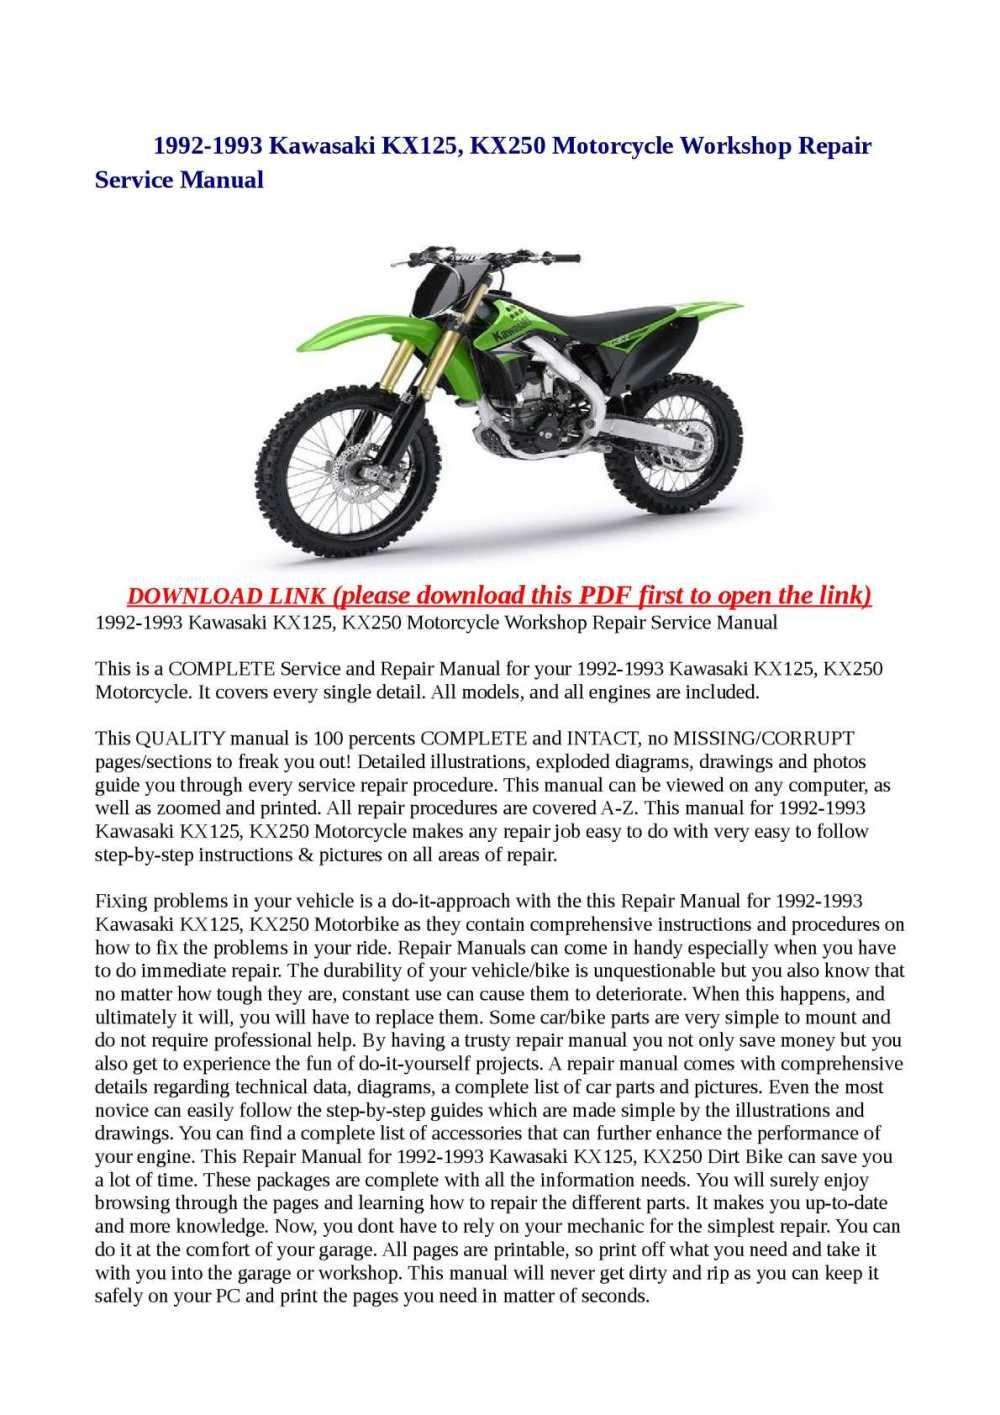 medium resolution of calam o 1992 1993 kawasaki kx125 kx250 motorcycle workshop repair service manual